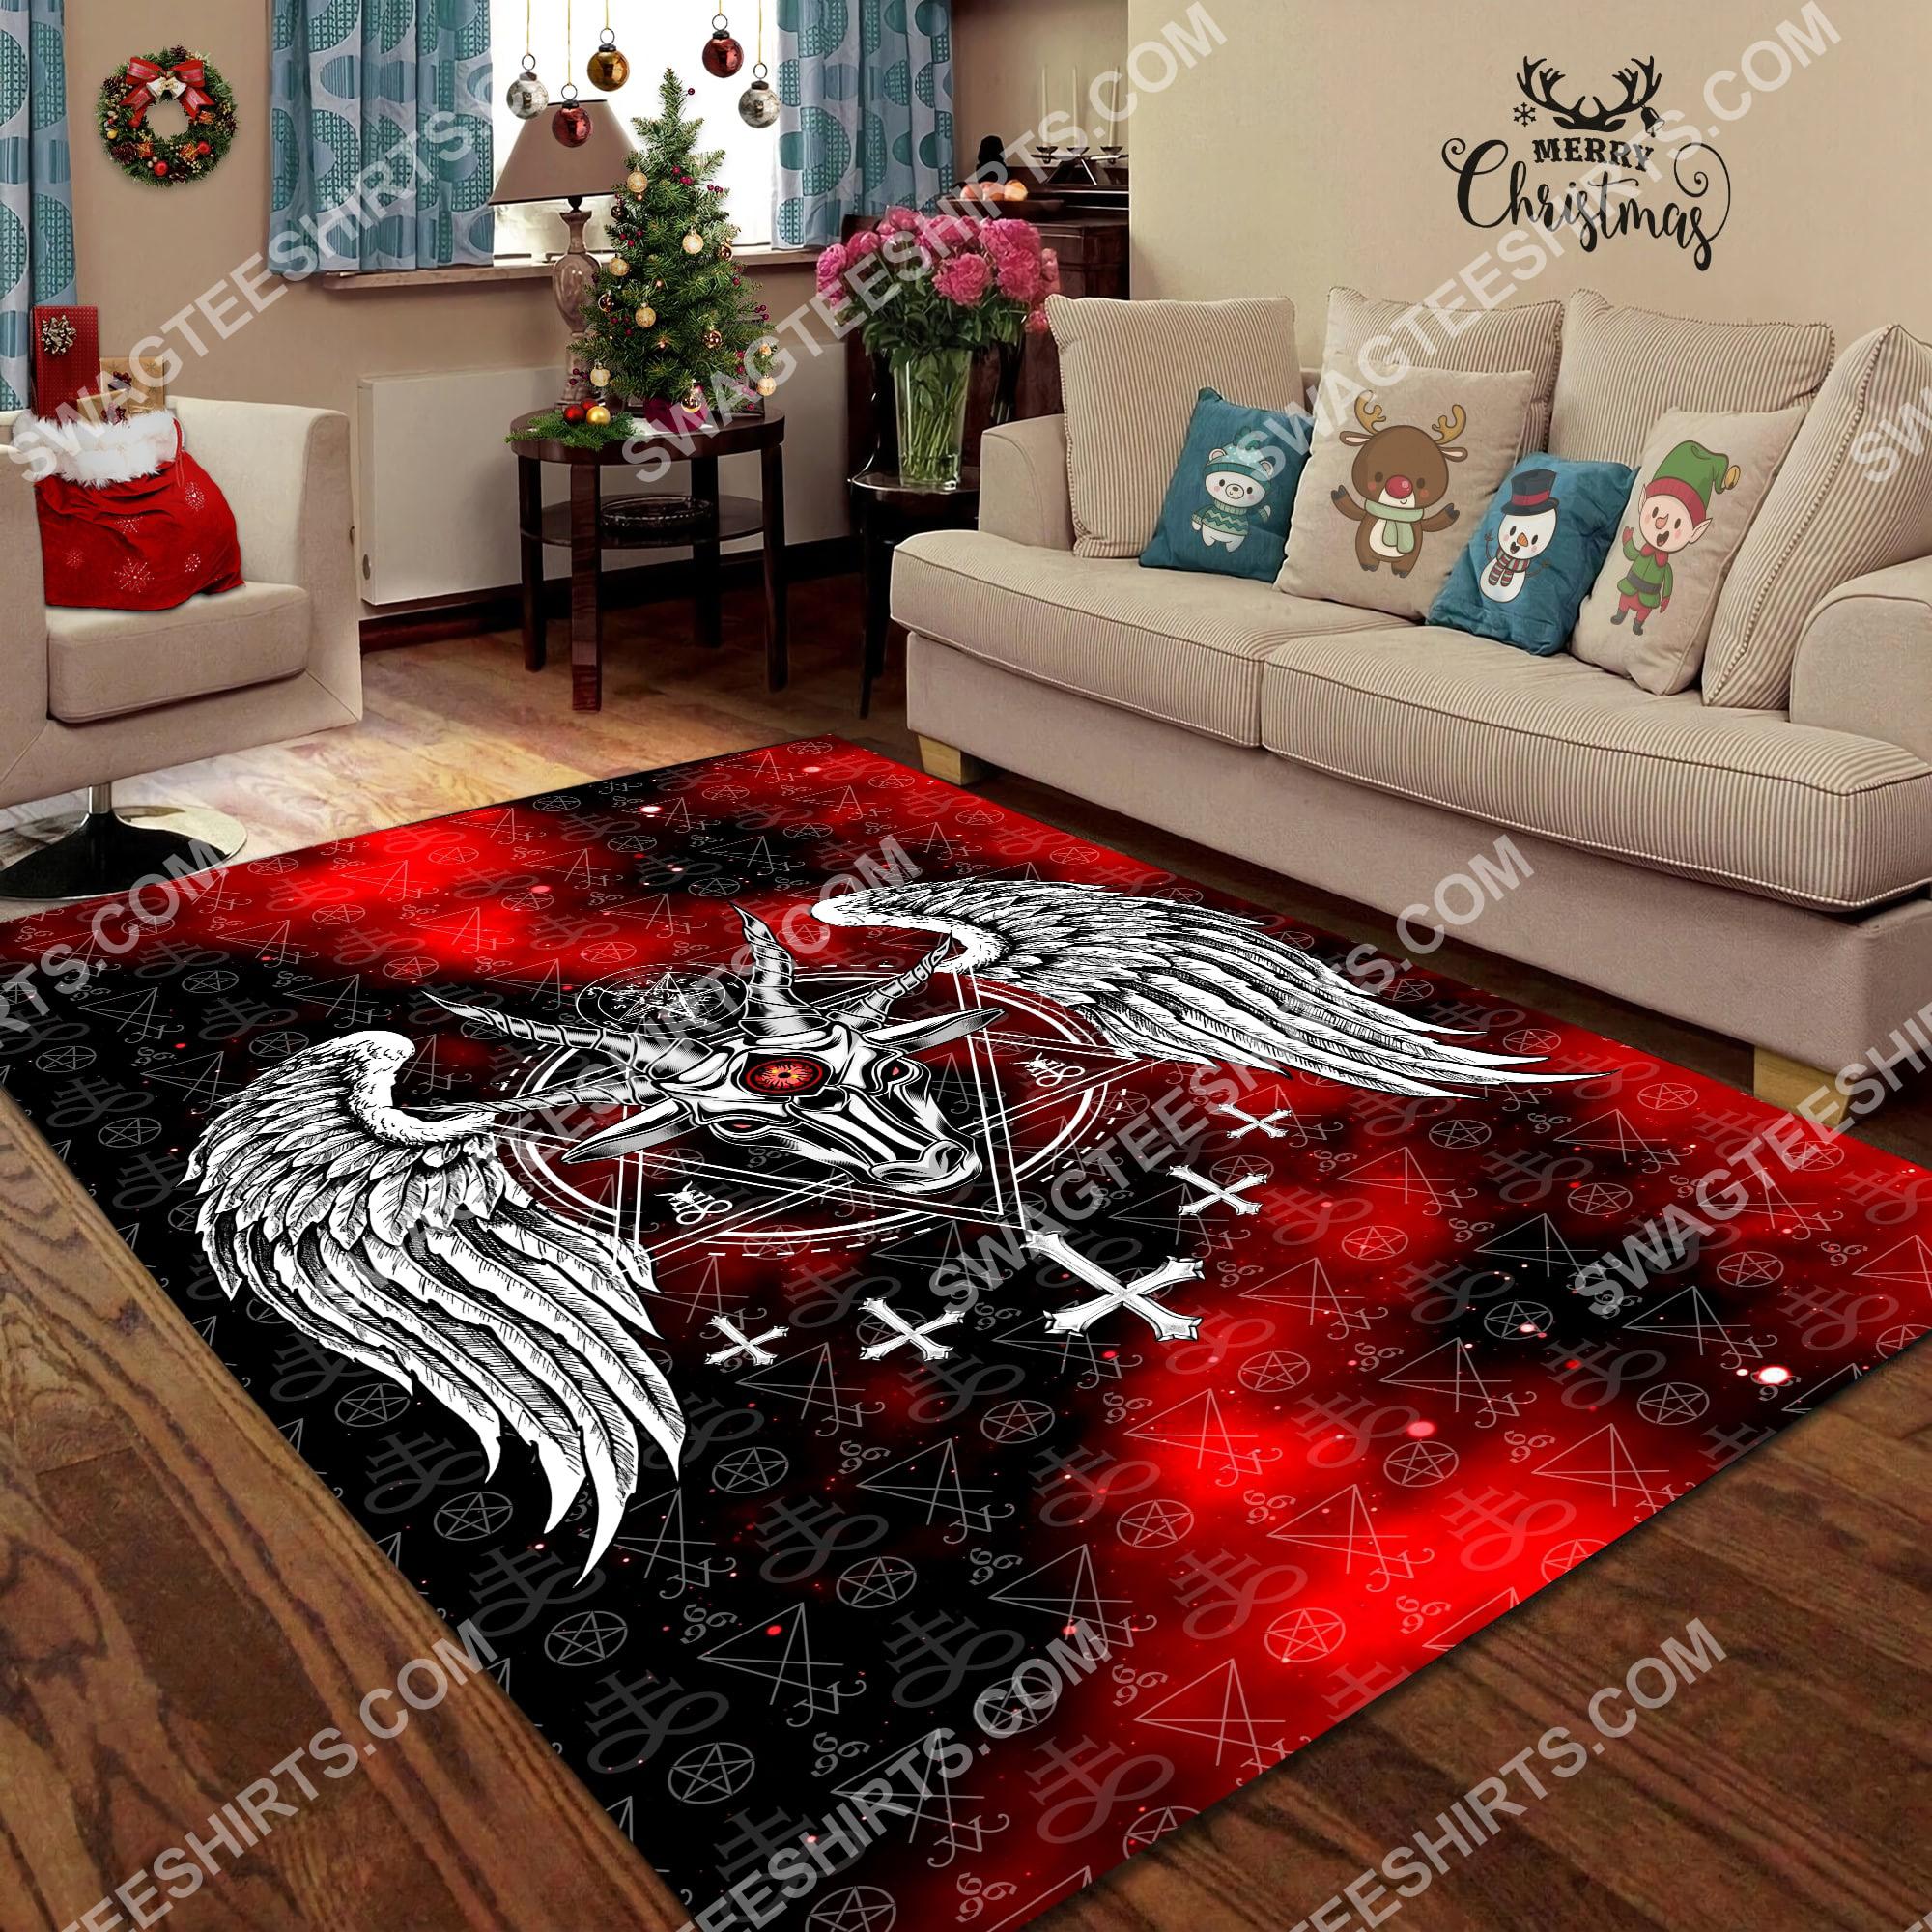 the satanic symbol all over printed rug 2(1) - Copy